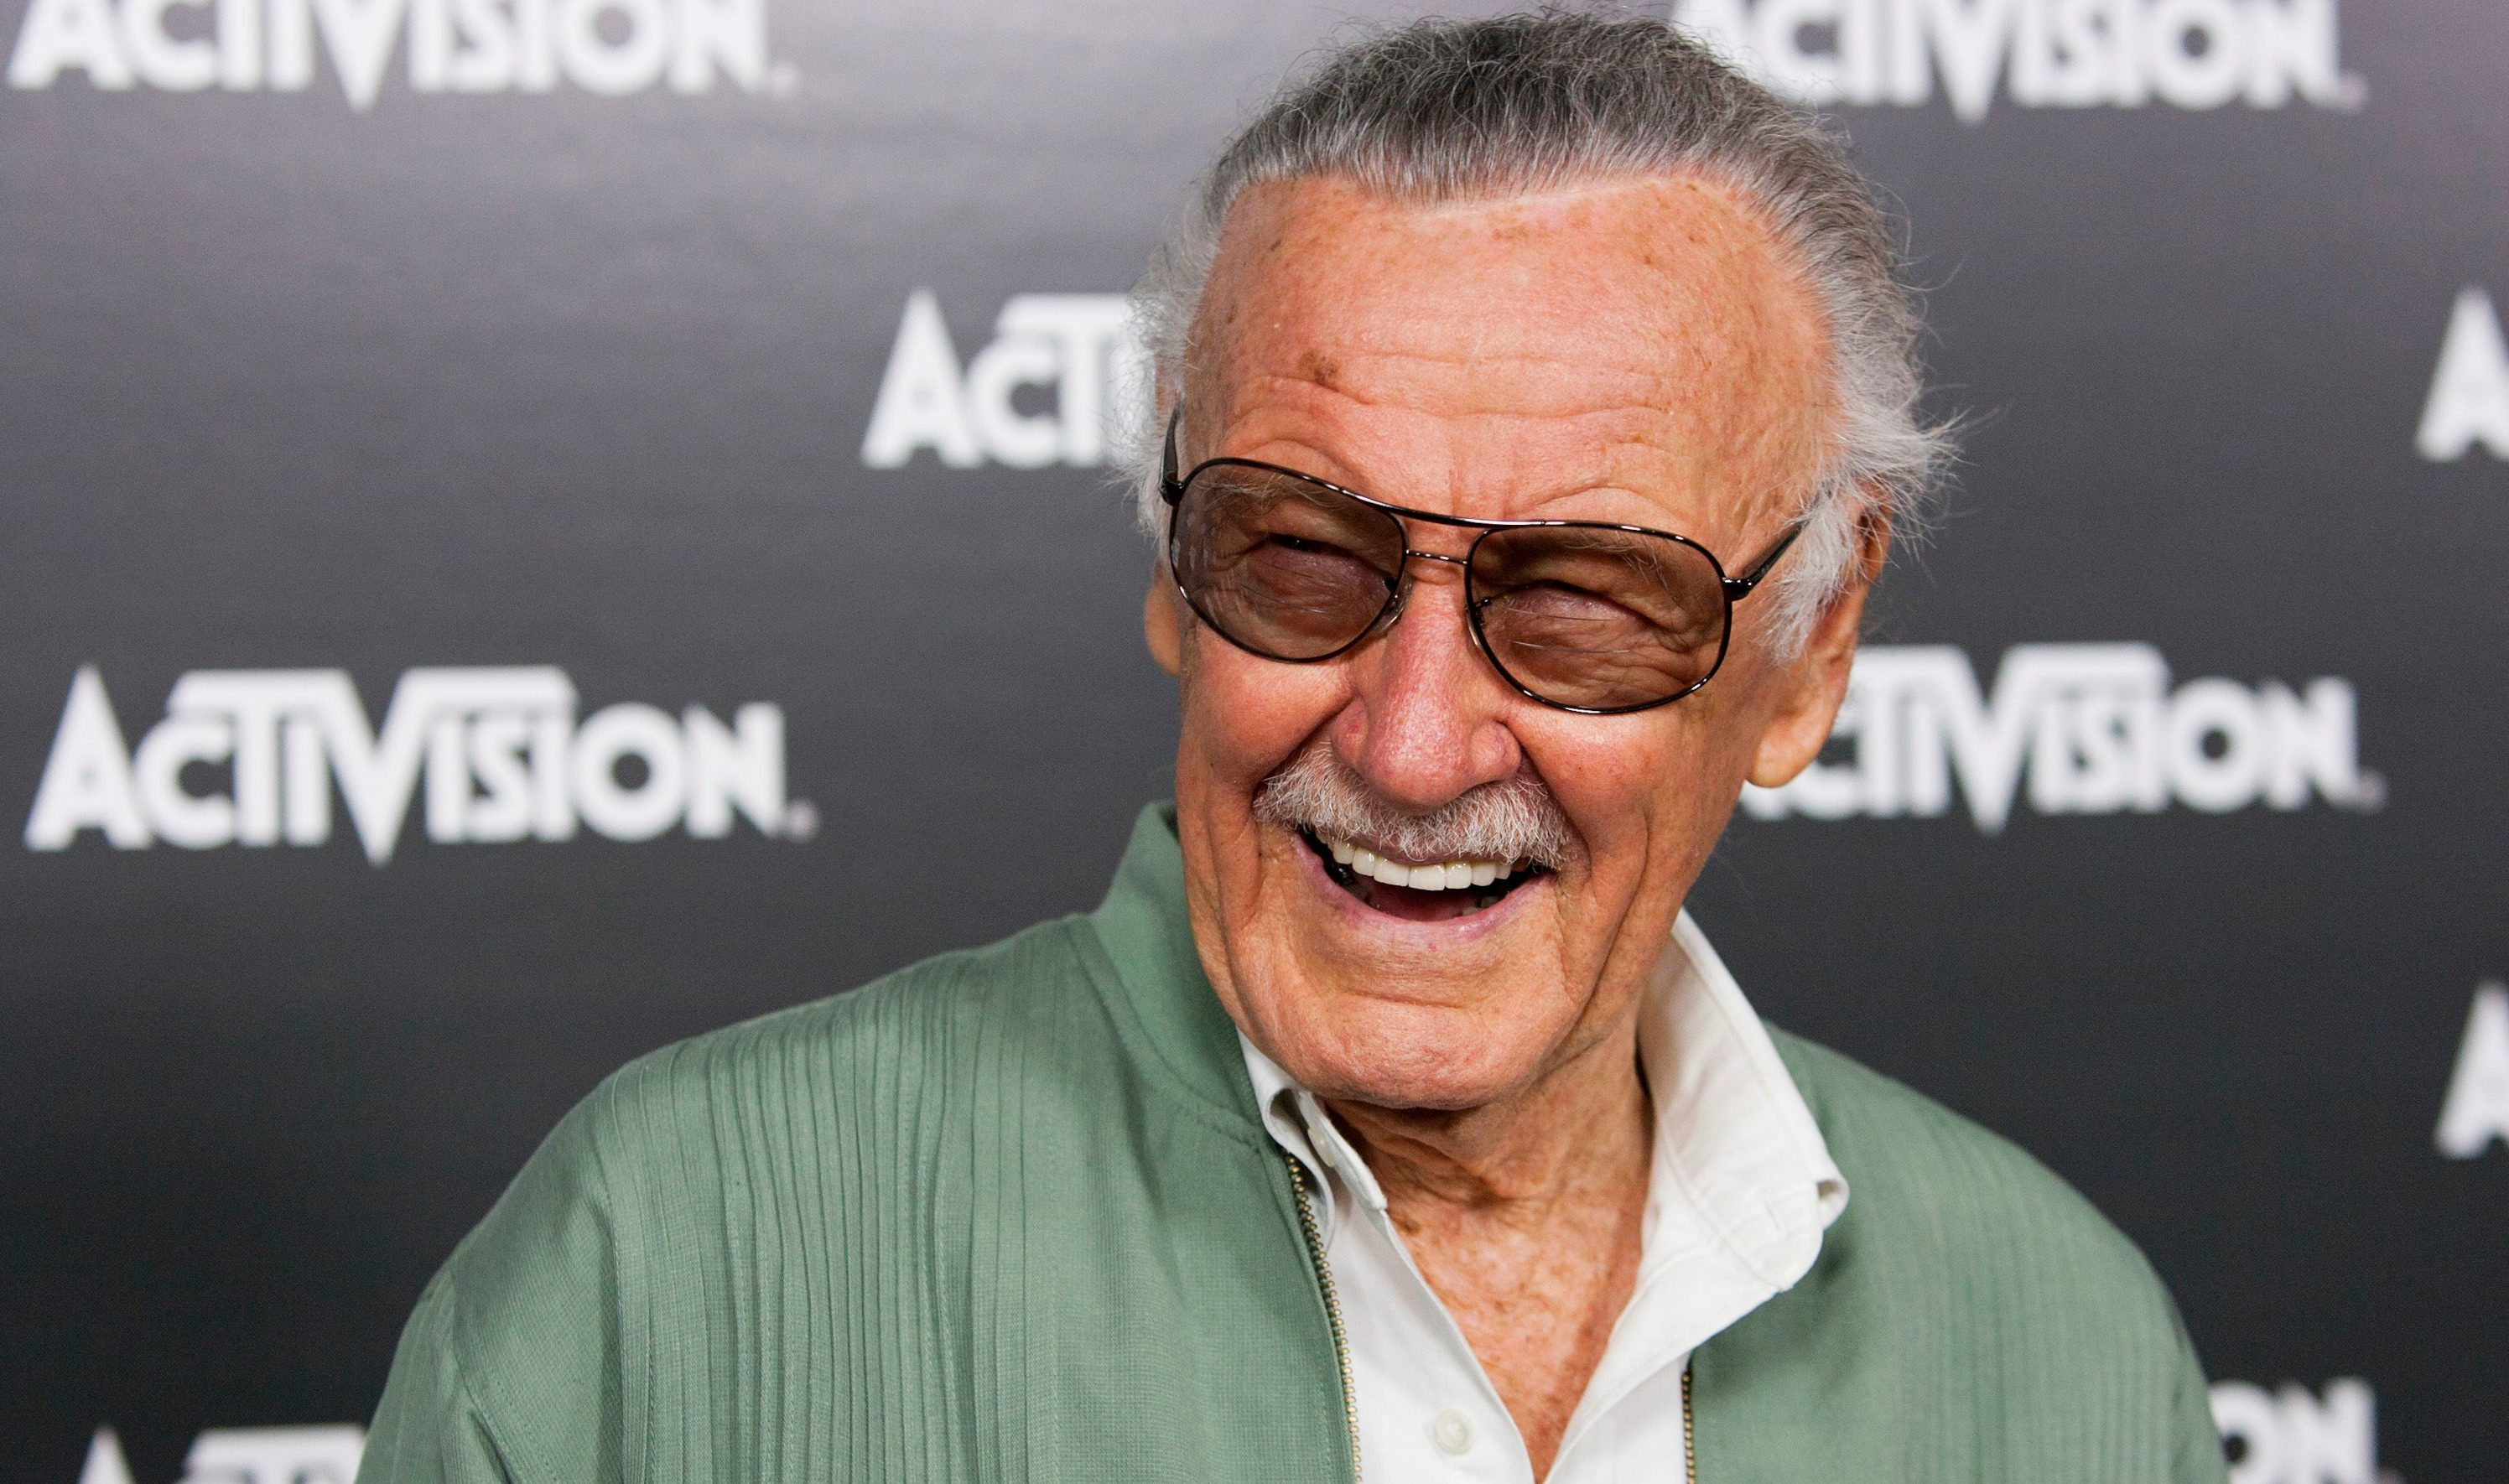 Stan Lee and Marvel saved comics